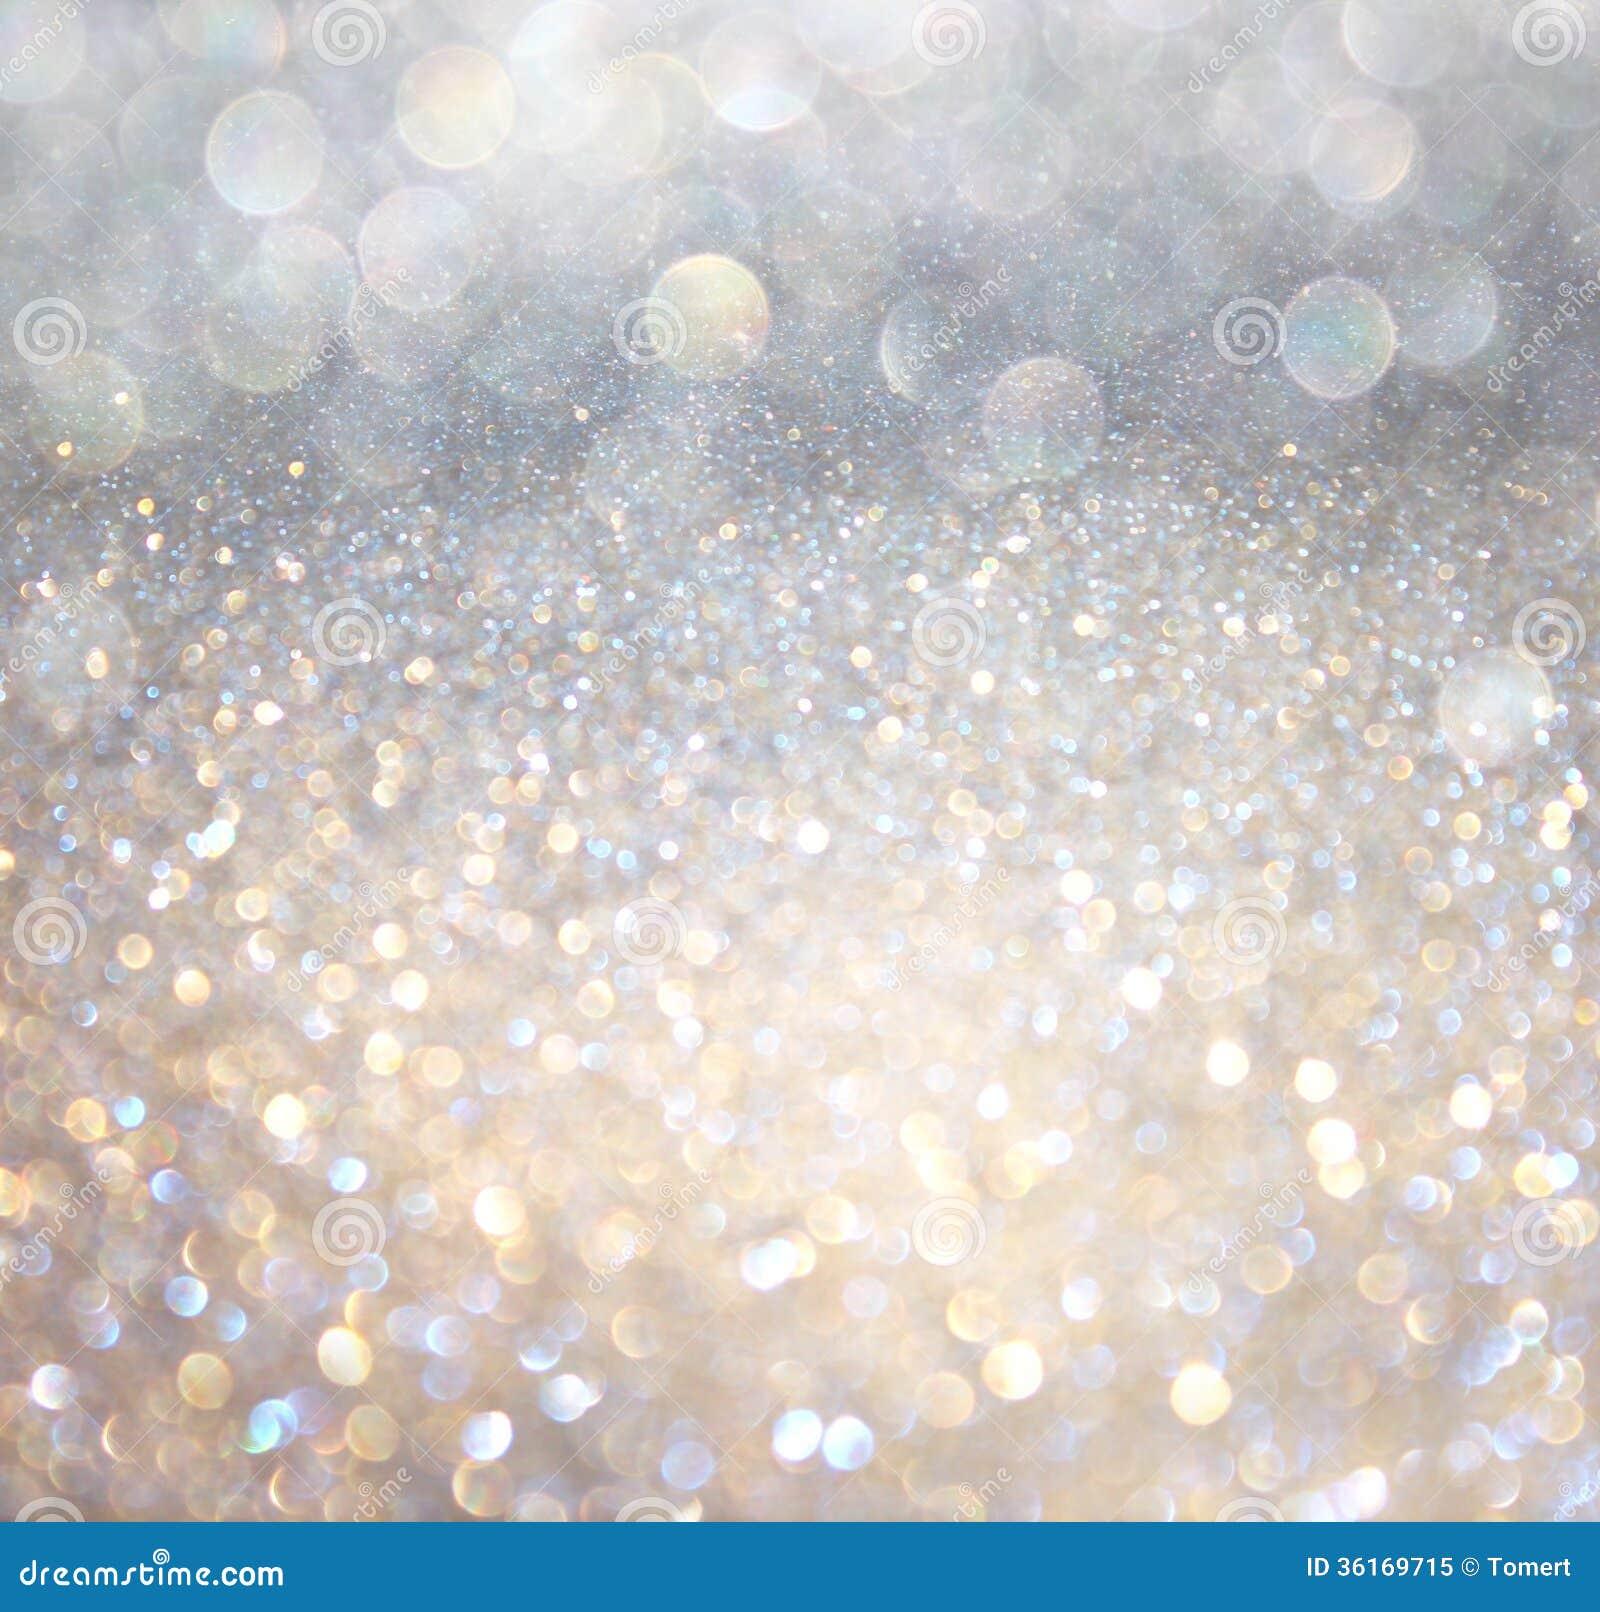 白色银和金抽象bokeh光。defocused背景